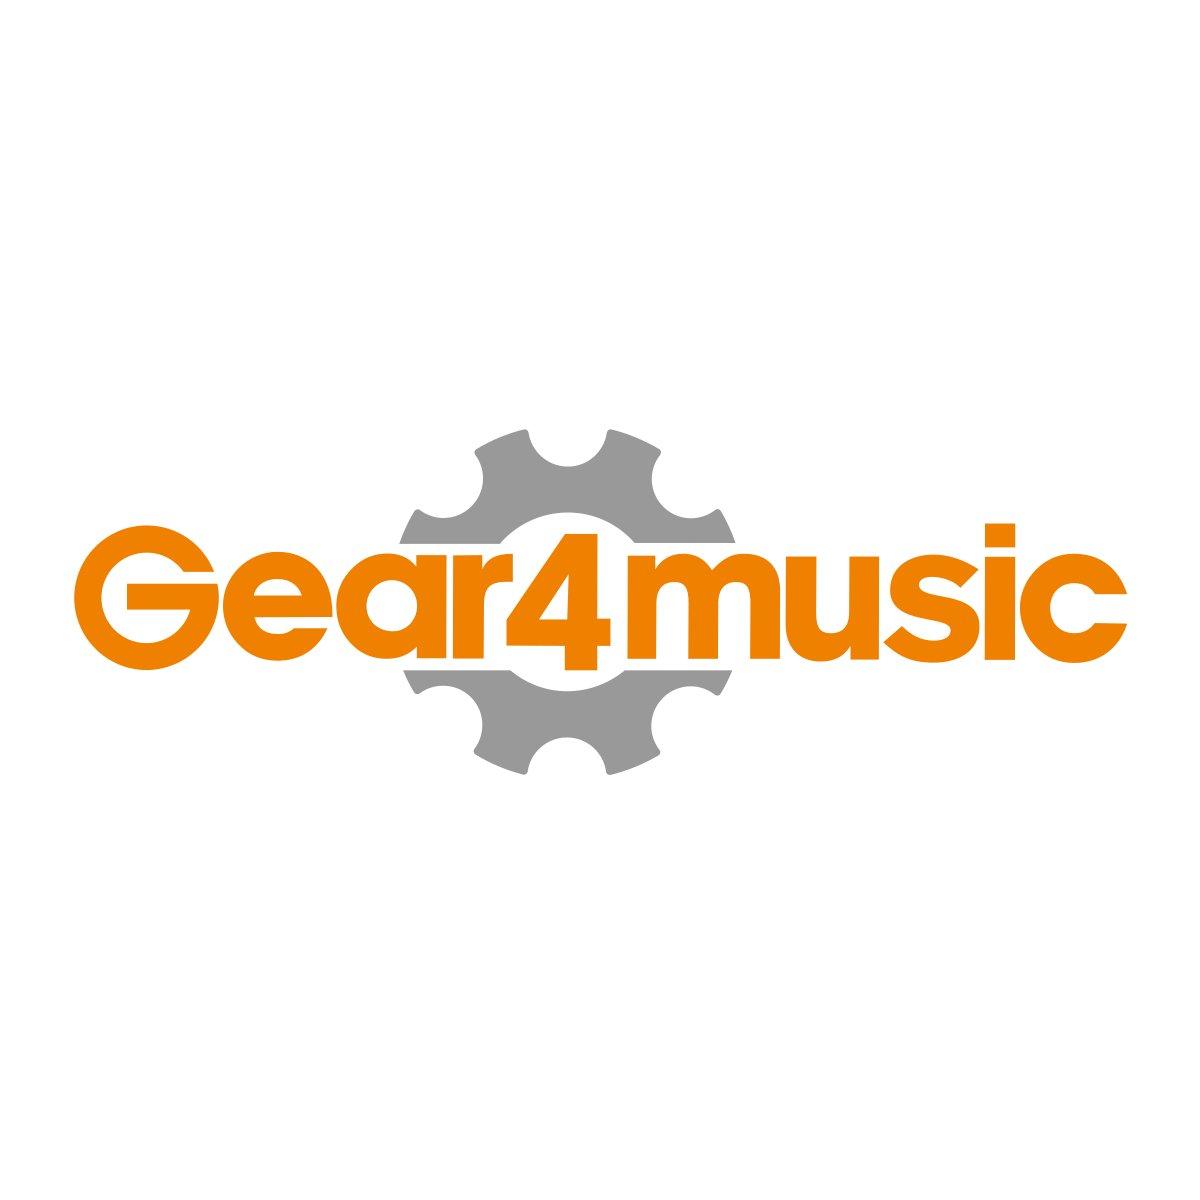 LA levou rukou elektrická kytara od Gear4music, růžová